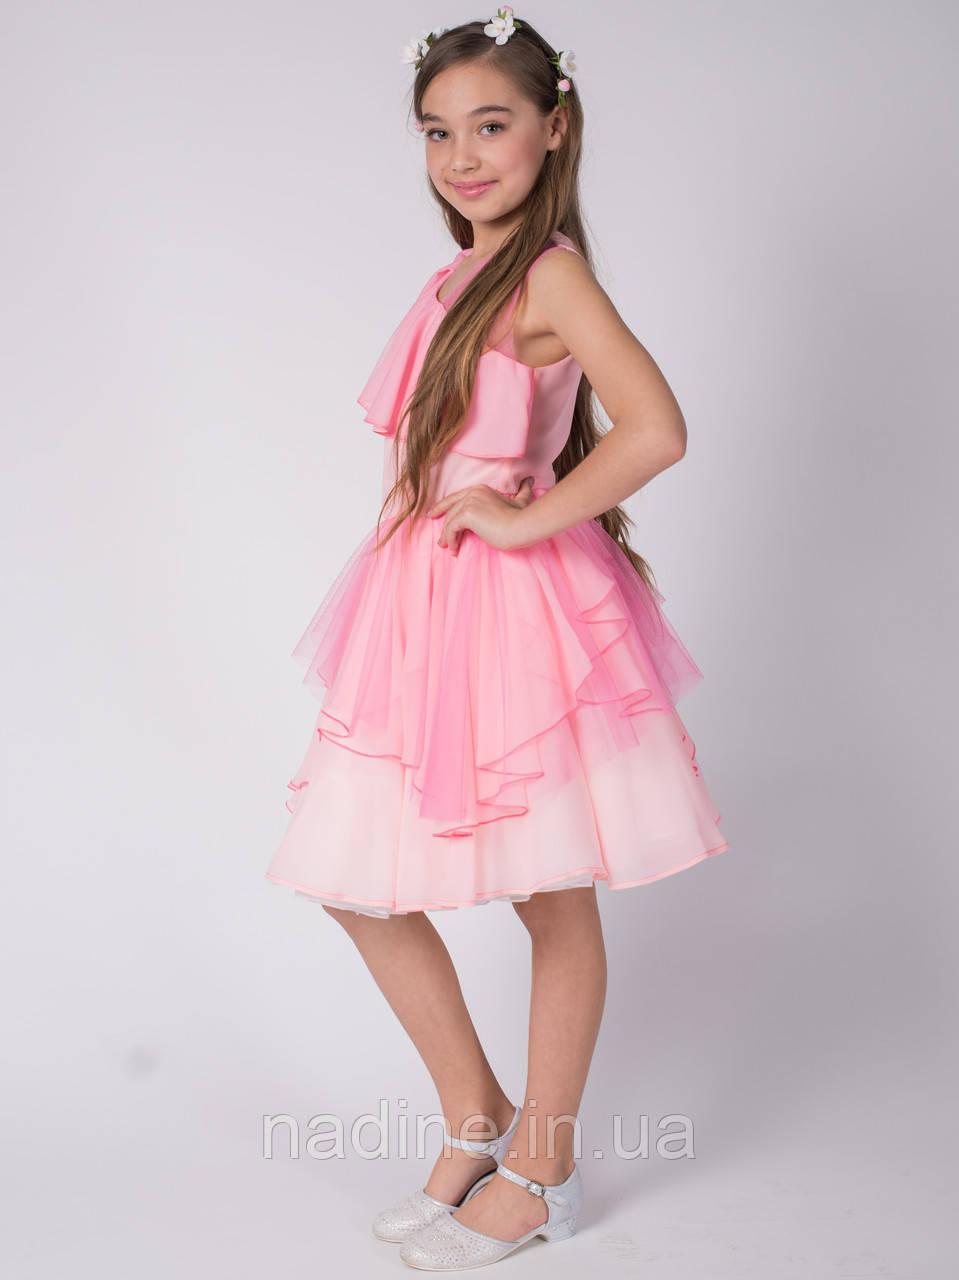 Шифоновое платье Romantic Sakura Eirena Nadine (131-40) на рост 140 Нежно розовое